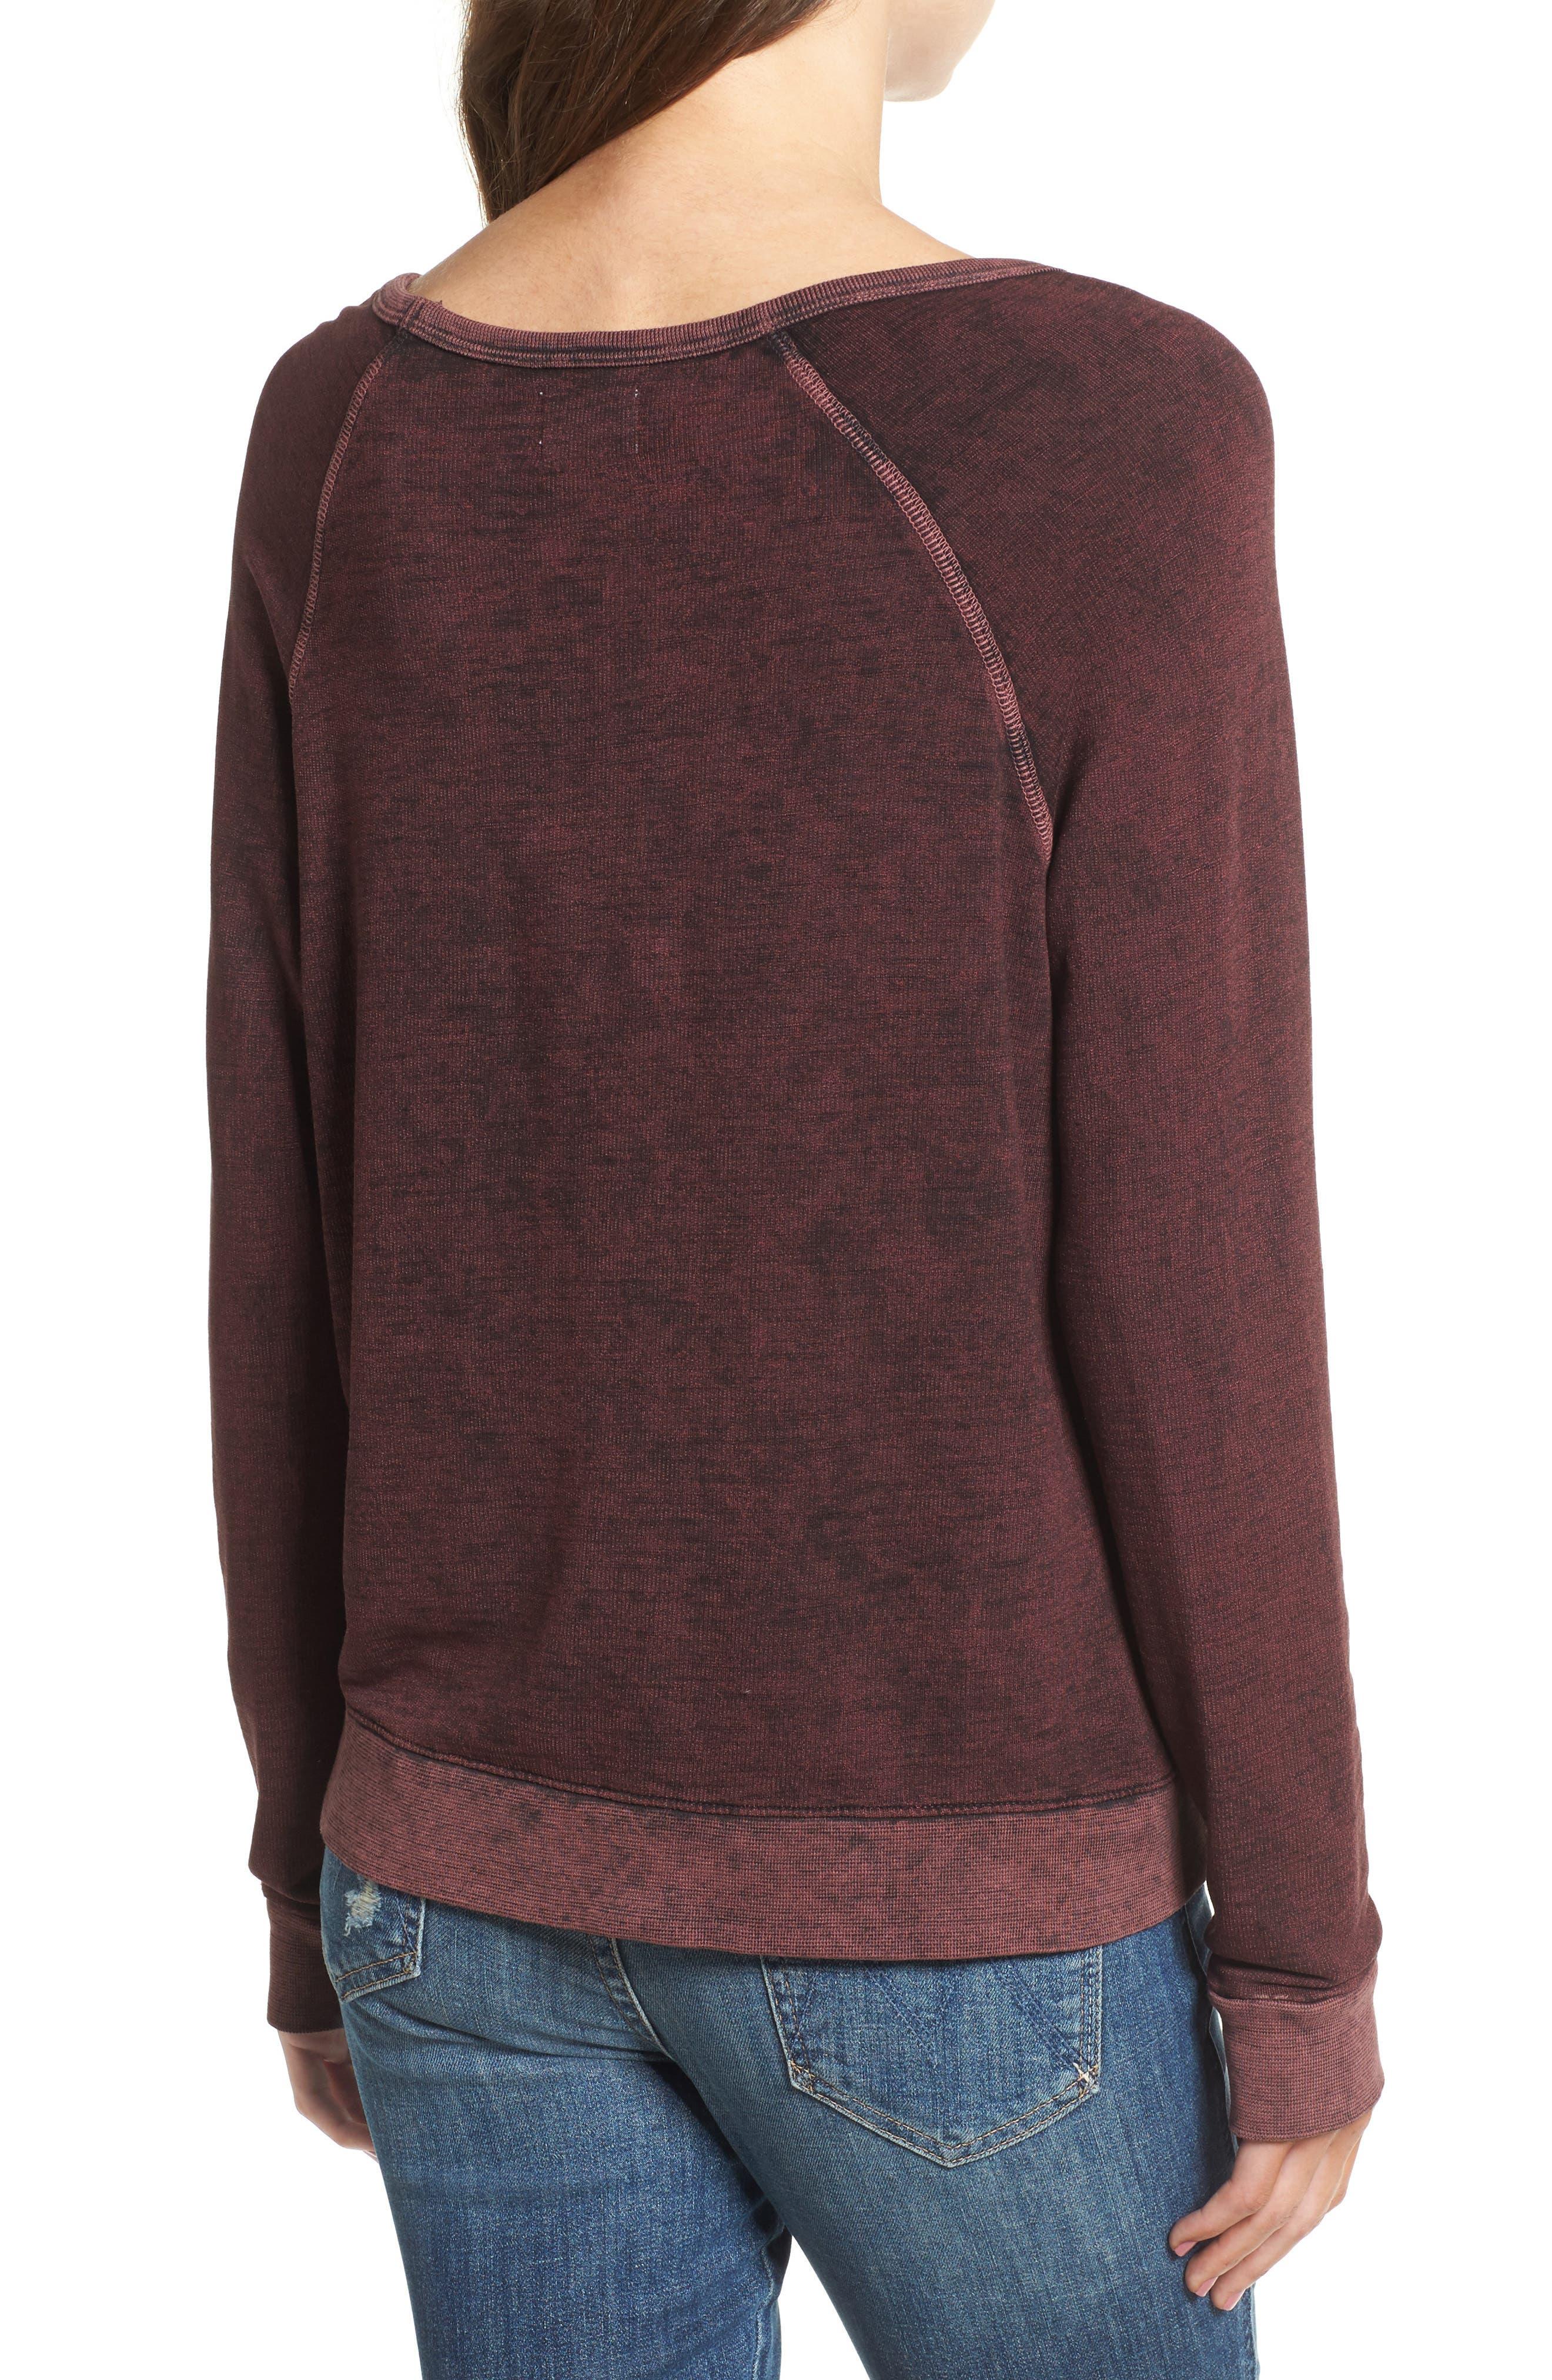 Active Winter Wonderland Sweatshirt,                             Alternate thumbnail 2, color,                             Burgundy Acid Wash